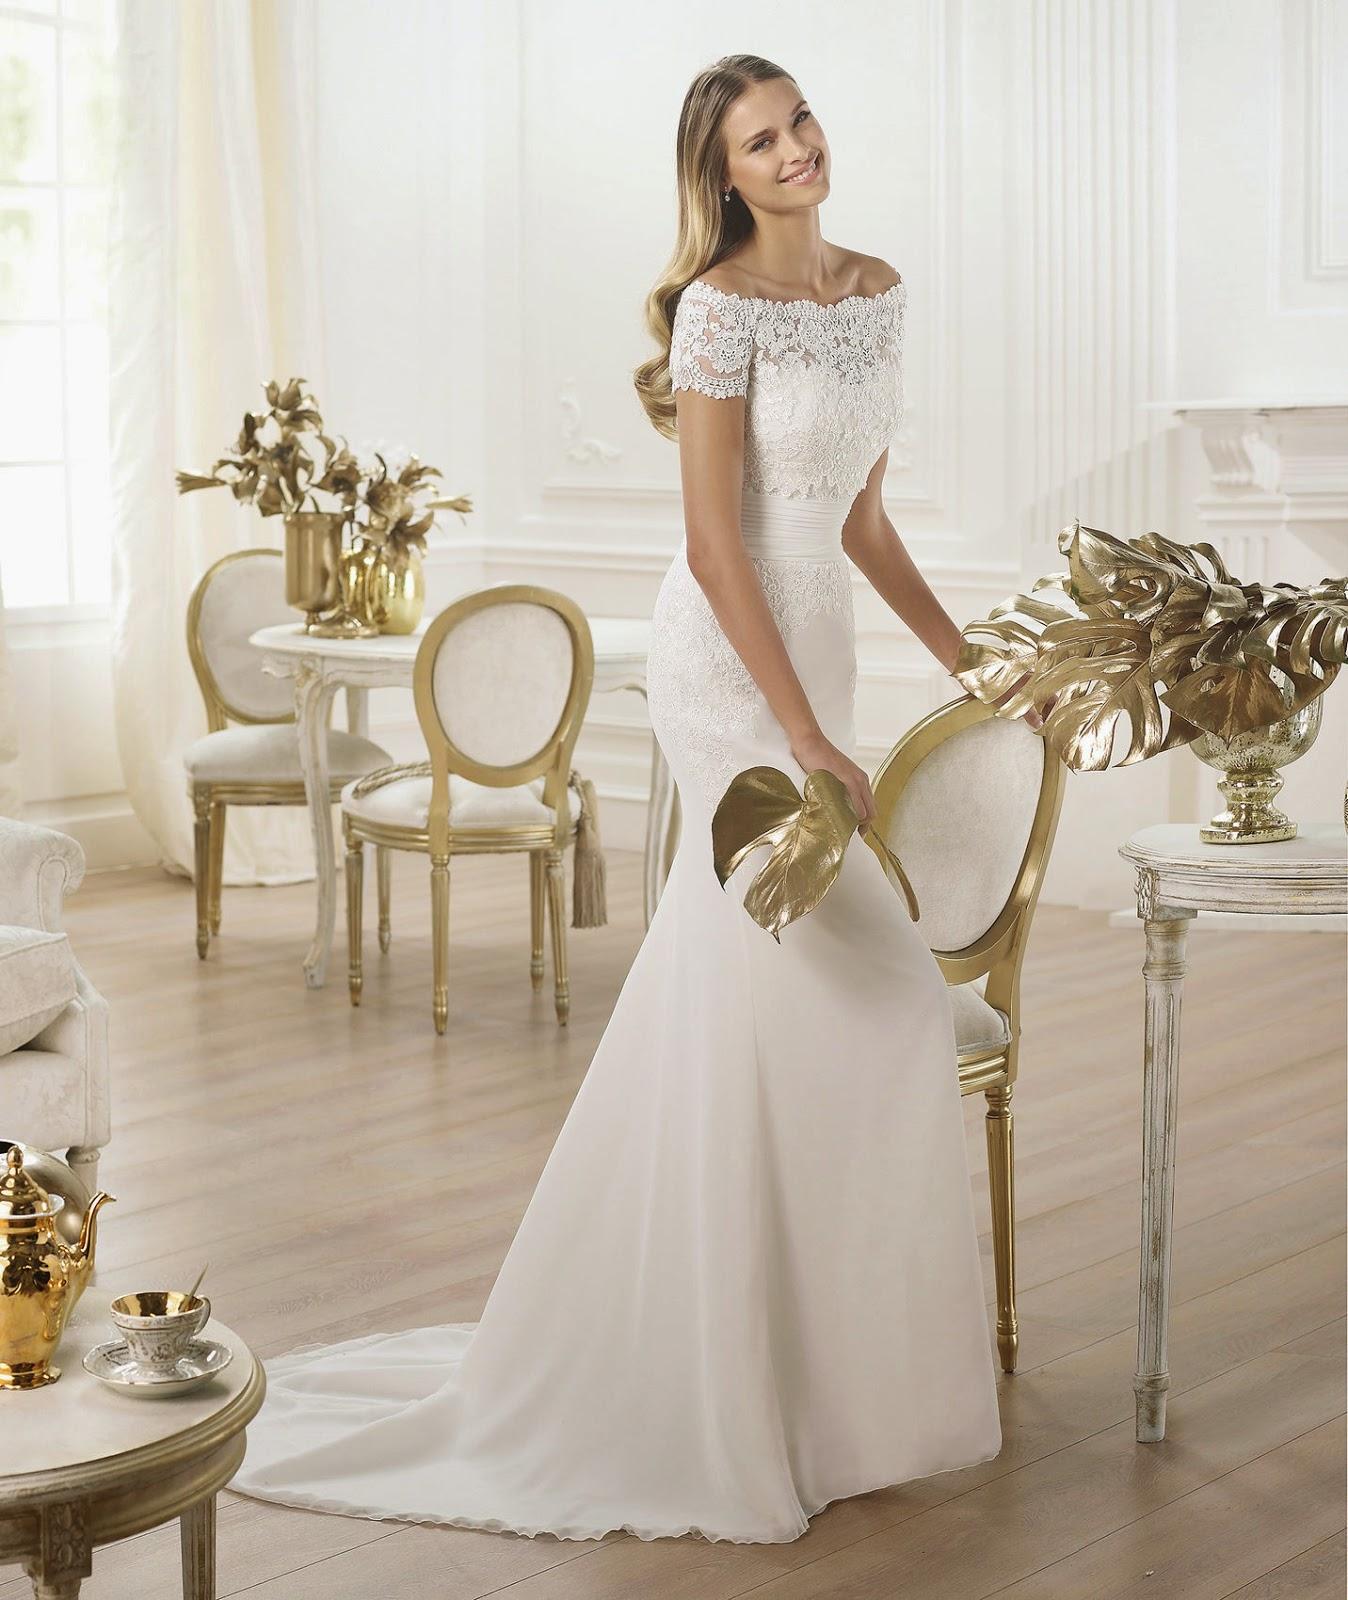 Robe mariée Atelier Pronovias 2014 boléro col bateau dentelle wedding dress